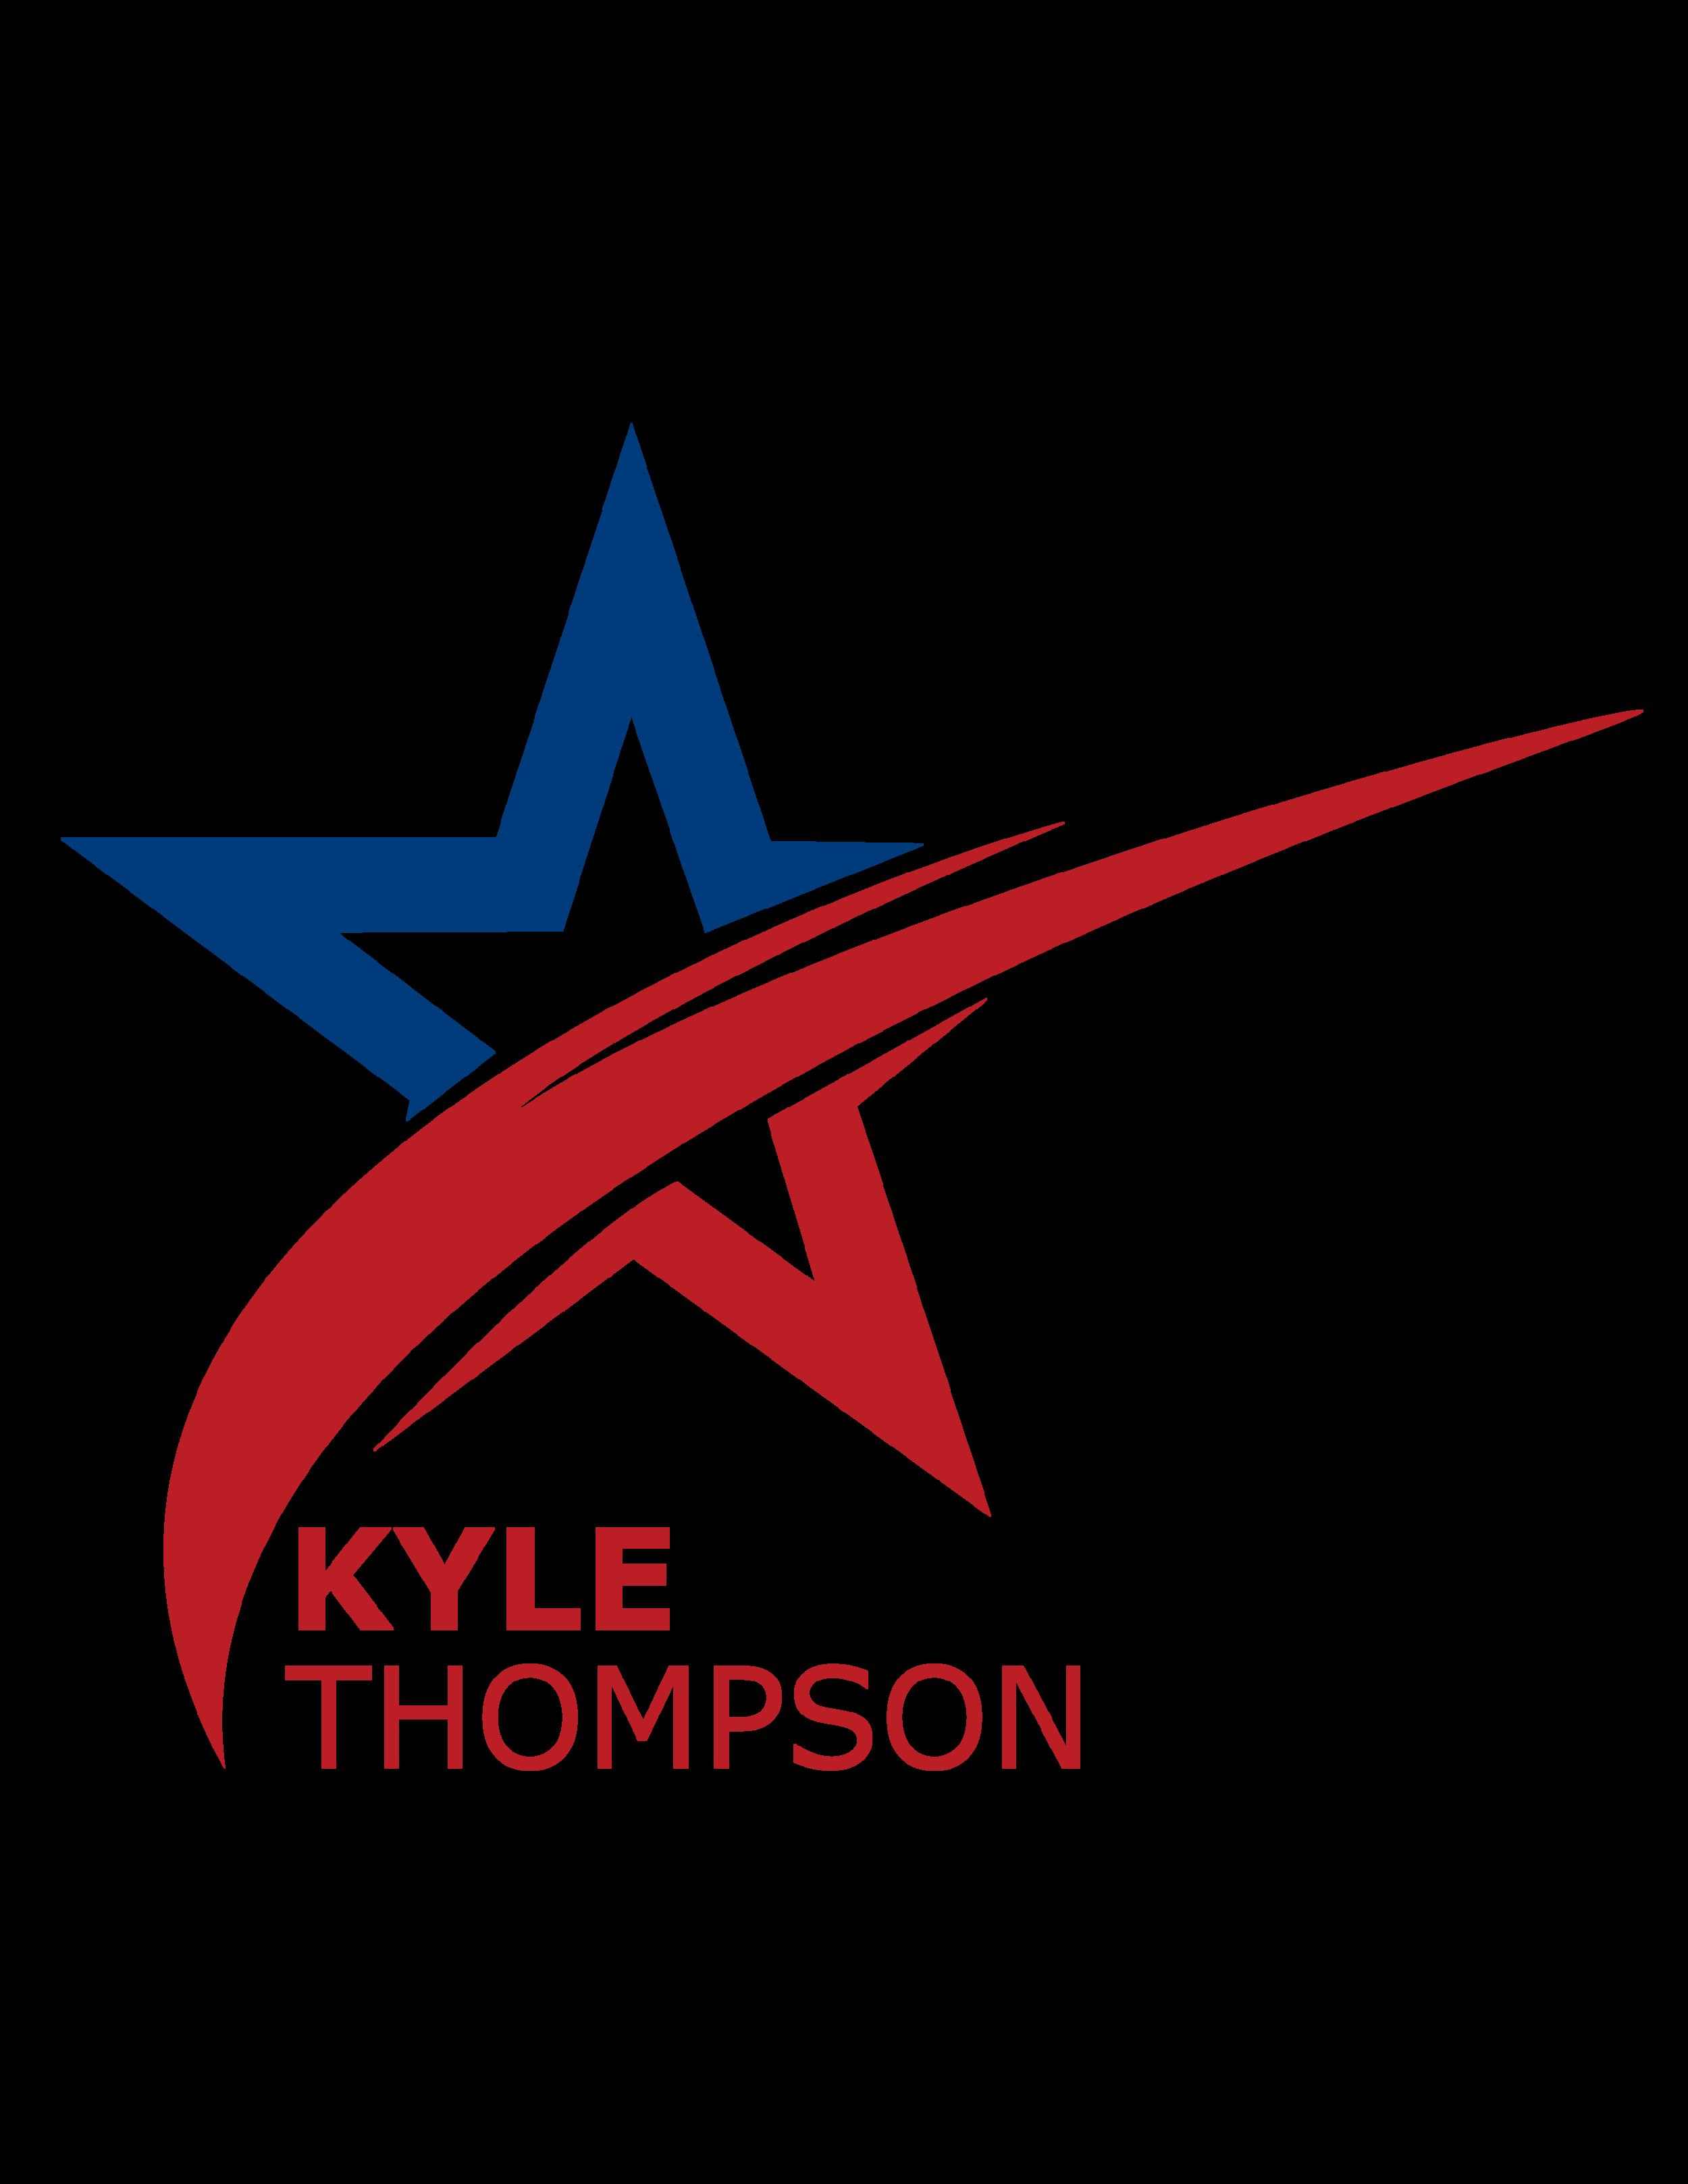 Kyle-logo_blue & red.png